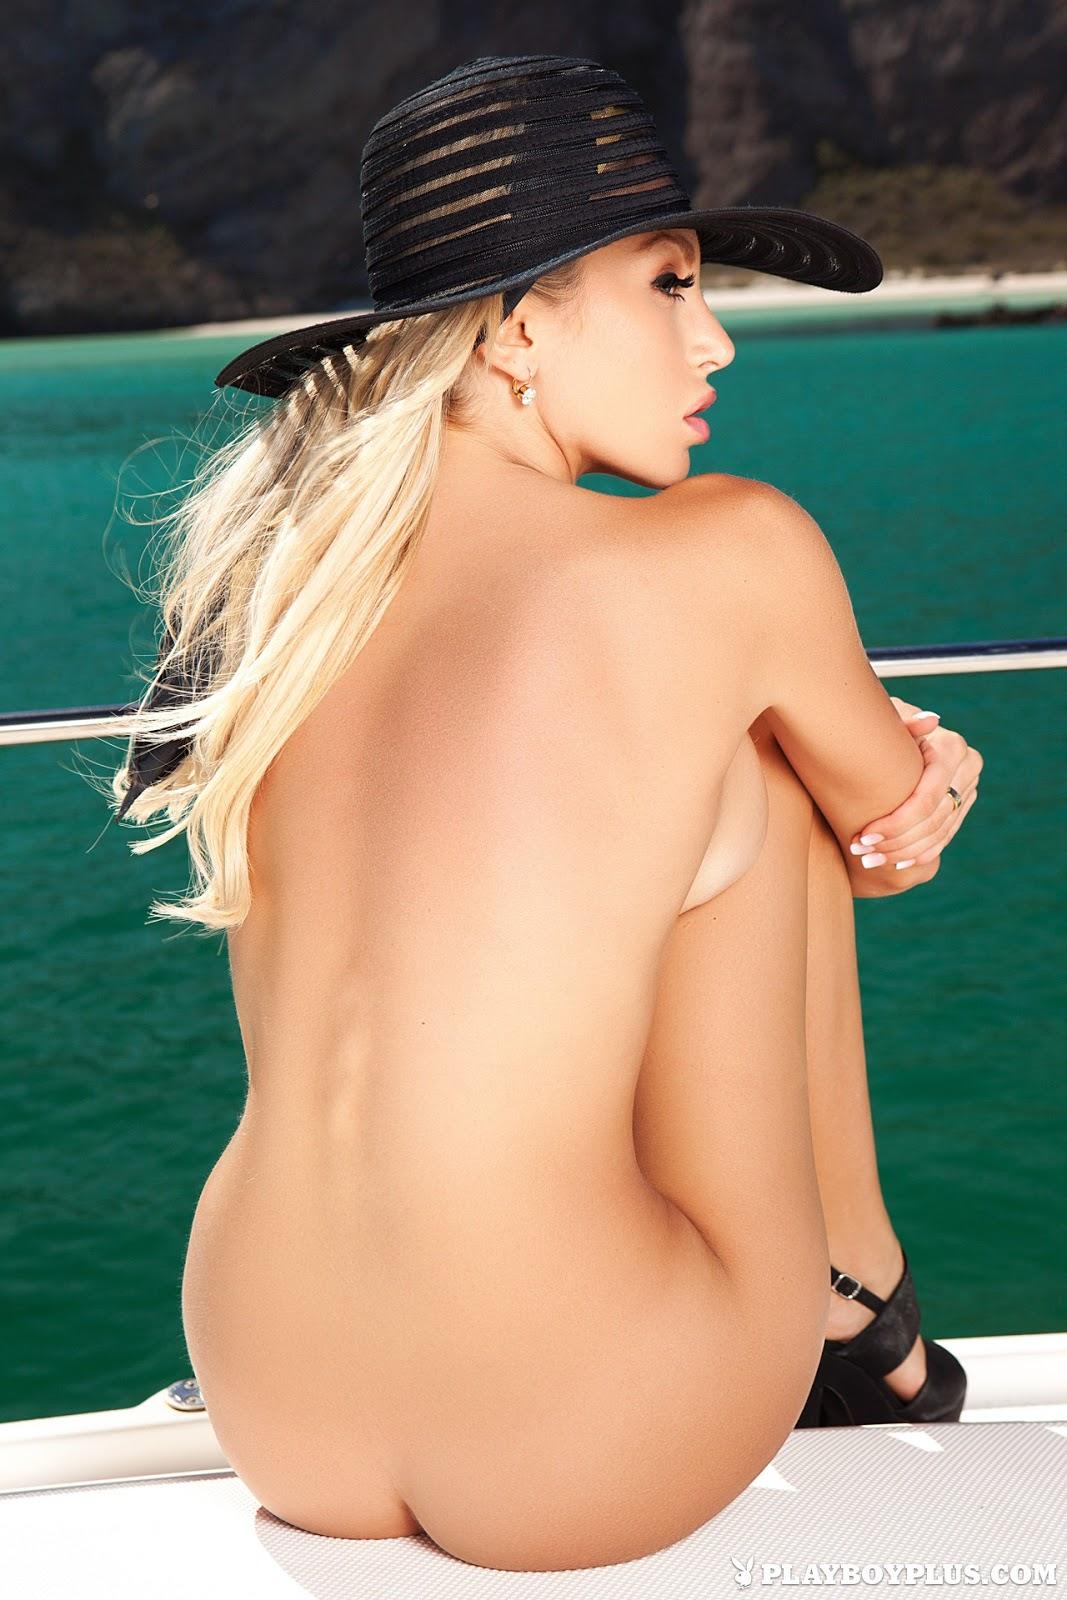 Khloe Terae on yacht Playboyplus